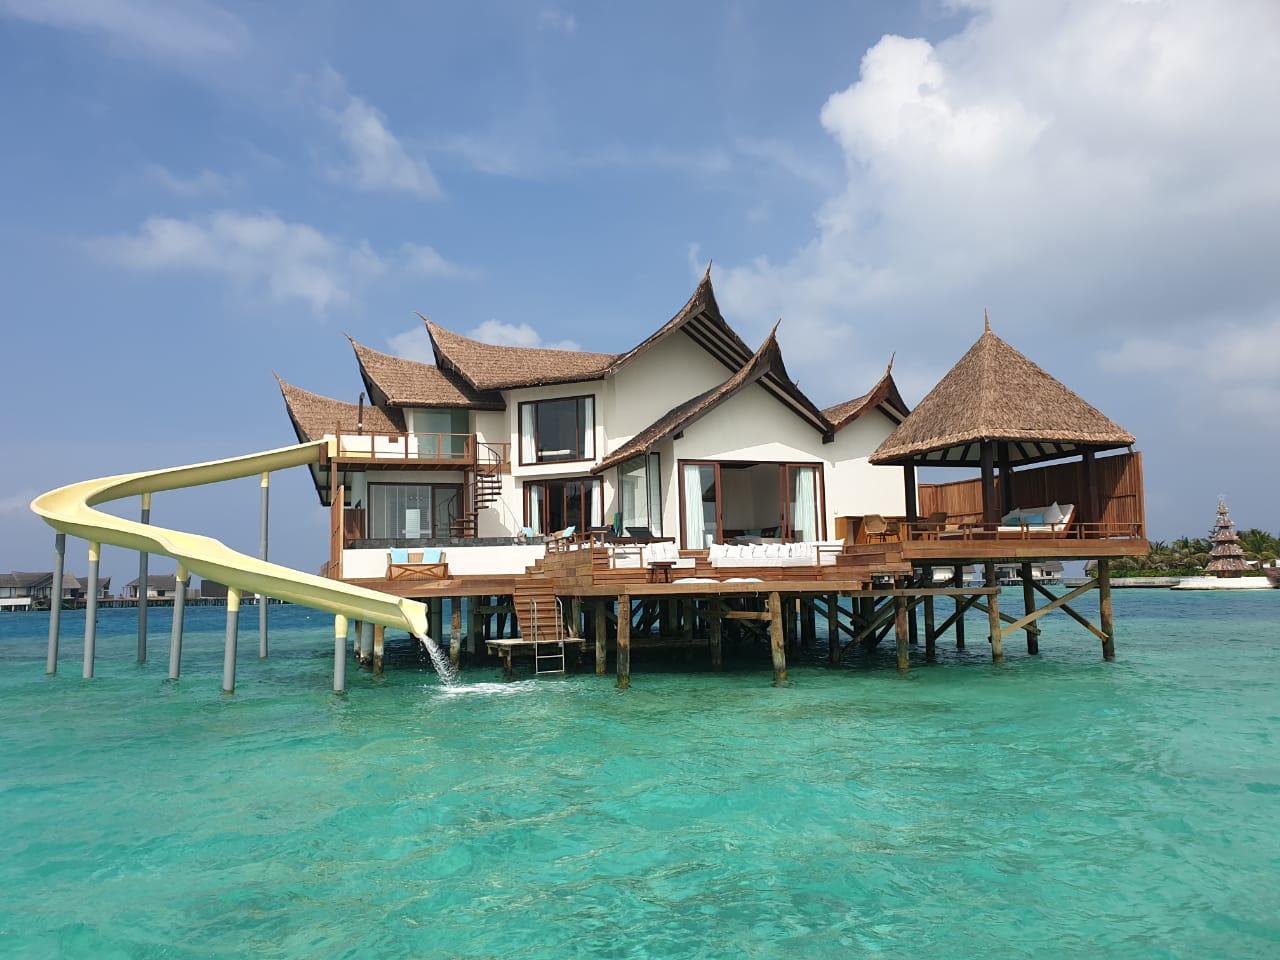 Fiber Thatch Maldives 02